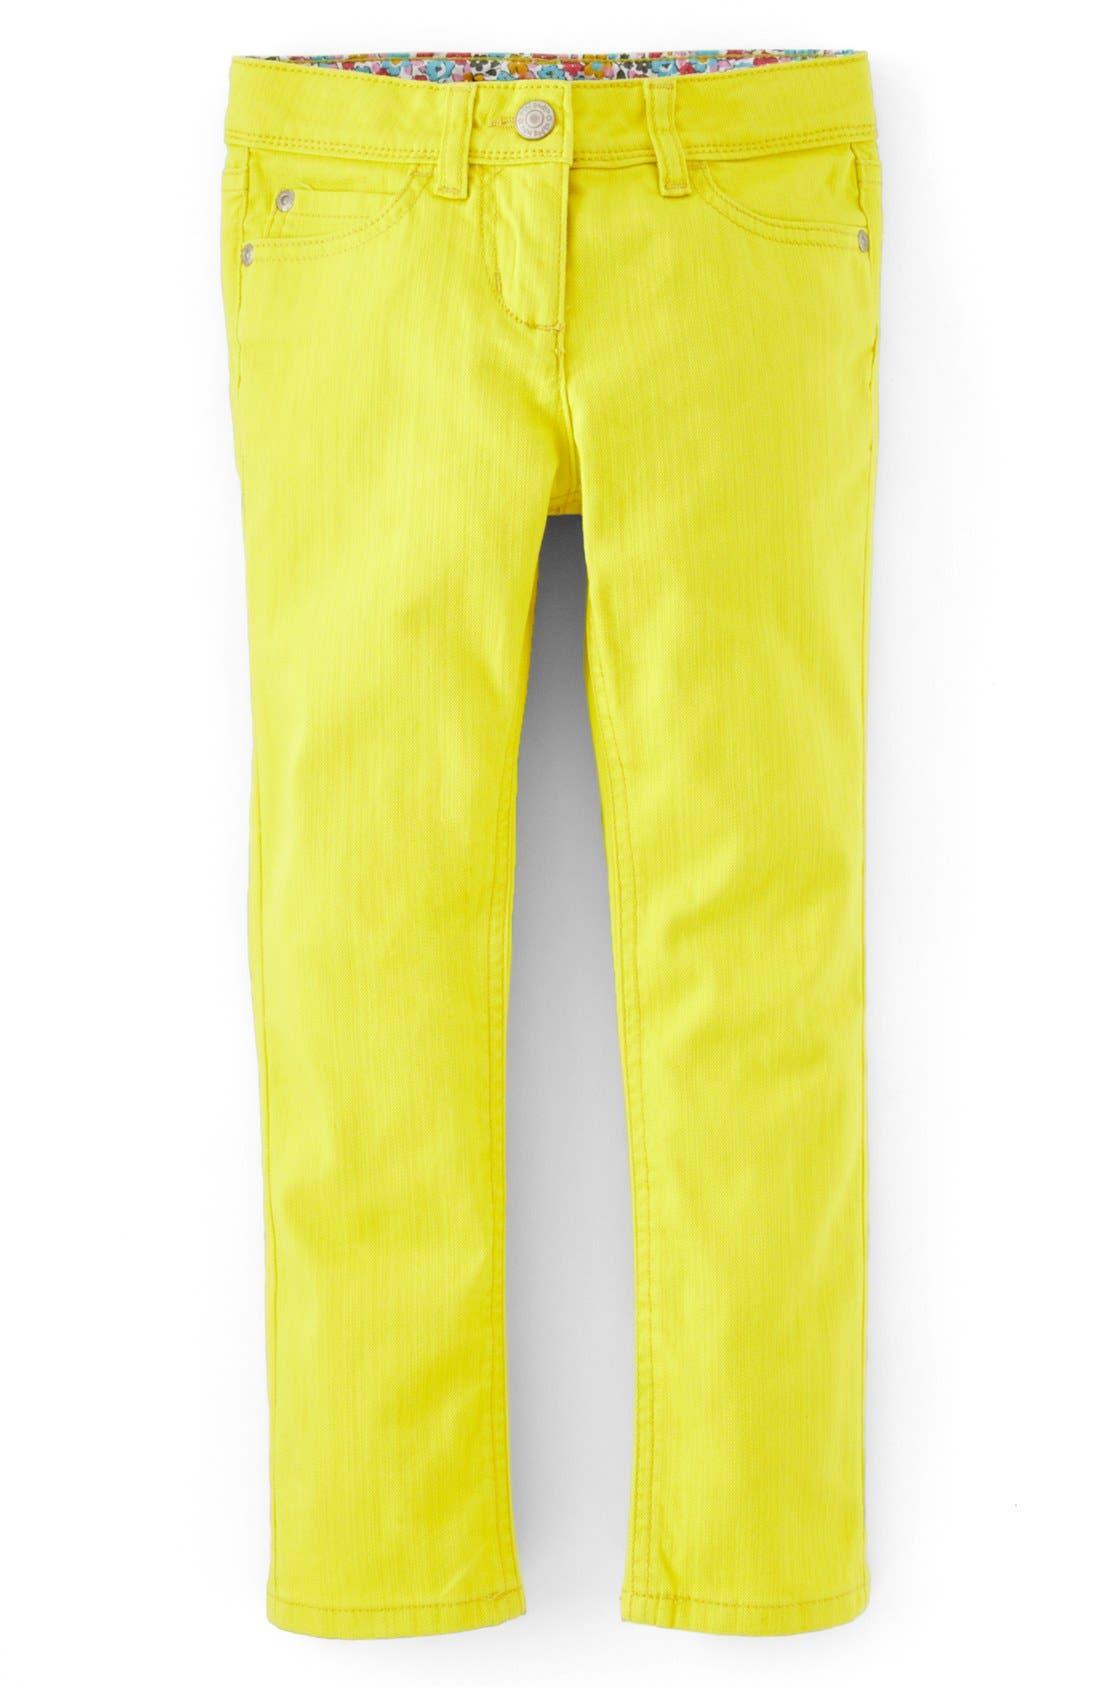 Alternate Image 1 Selected - Mini Boden Slim Fit Twill Jeans (Little Girls & Big Girls)